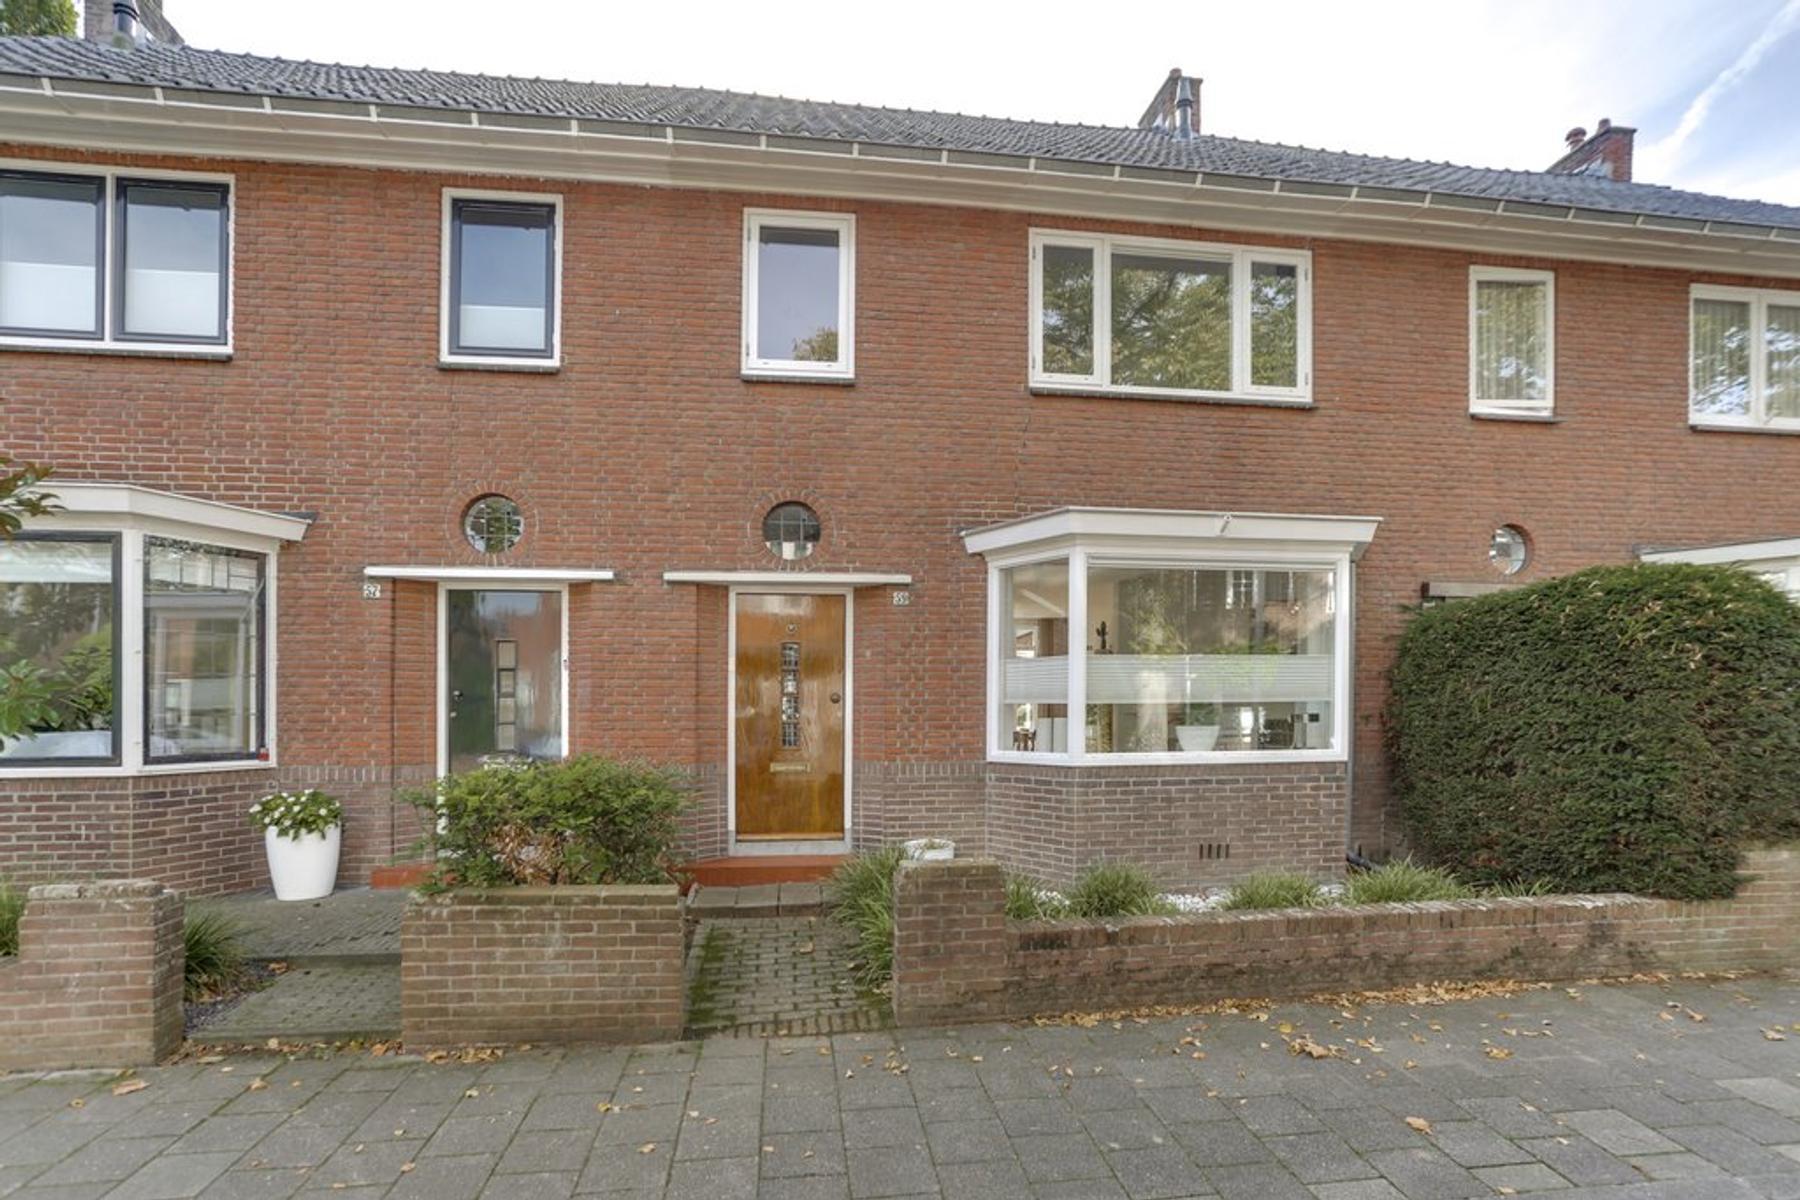 Koningin Emmastraat 59 in Gorinchem 4205 BL